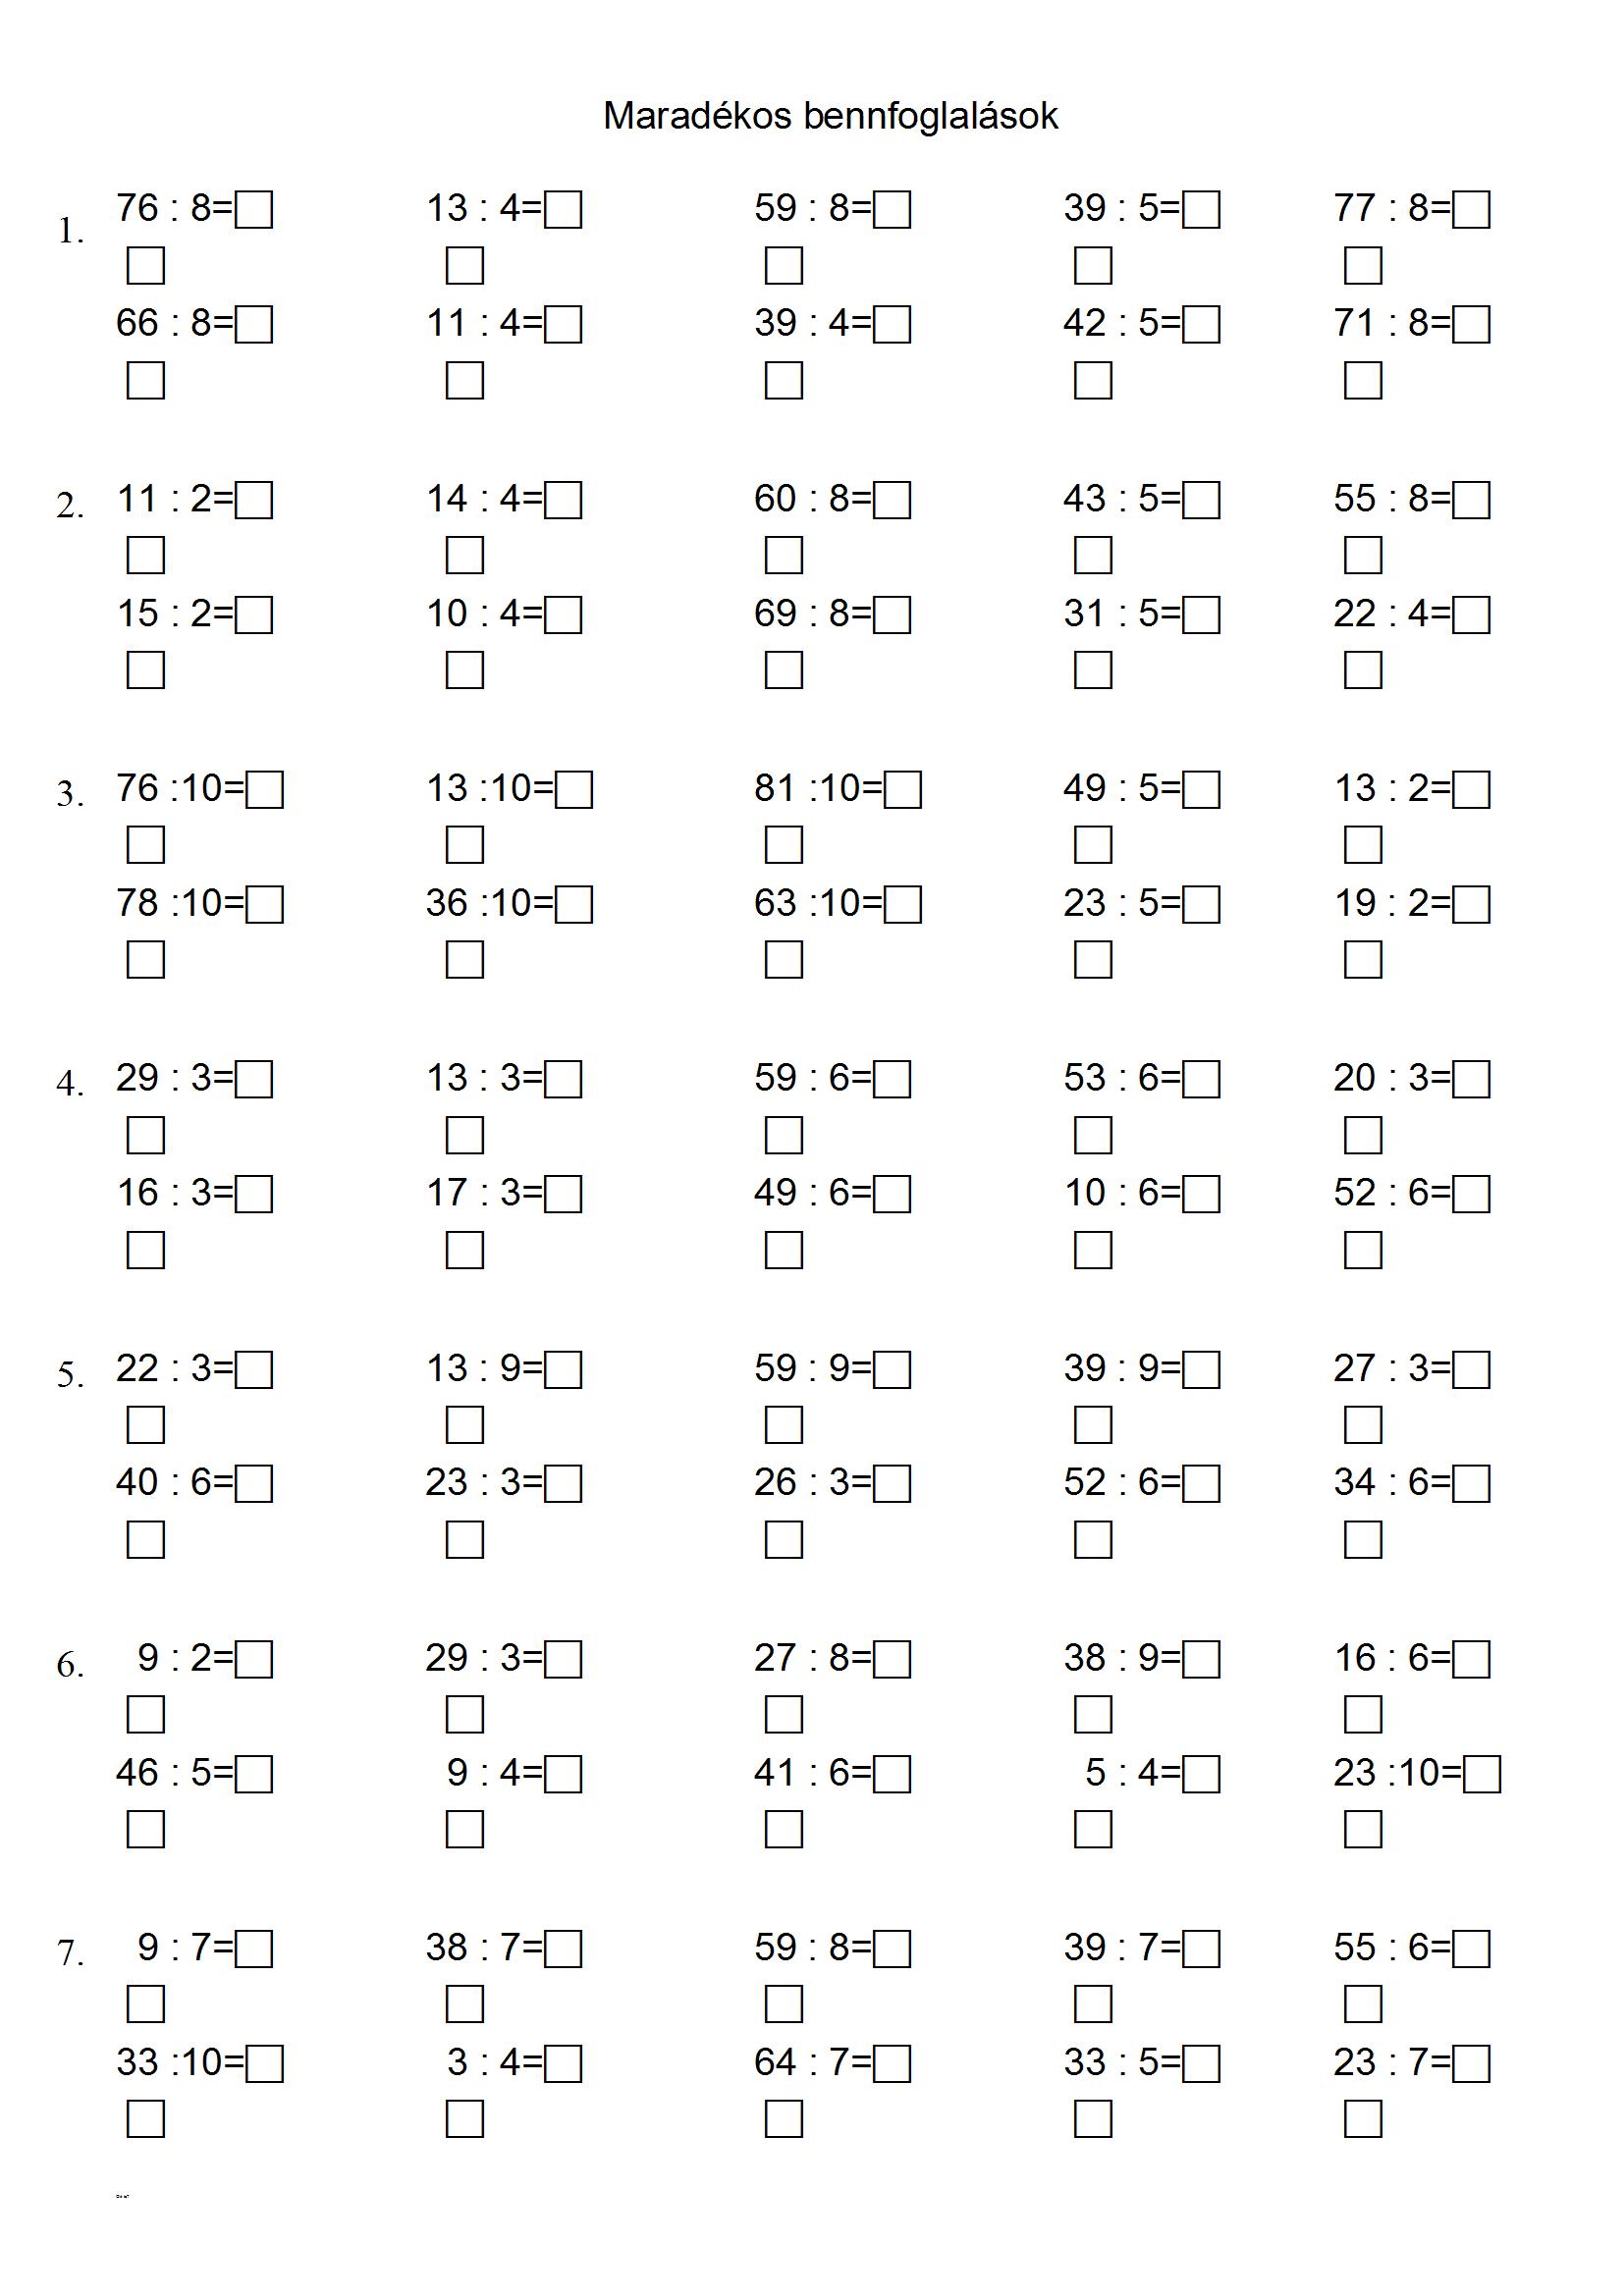 small resolution of Maradékos bennfoglalások1.doc   Homeschool math